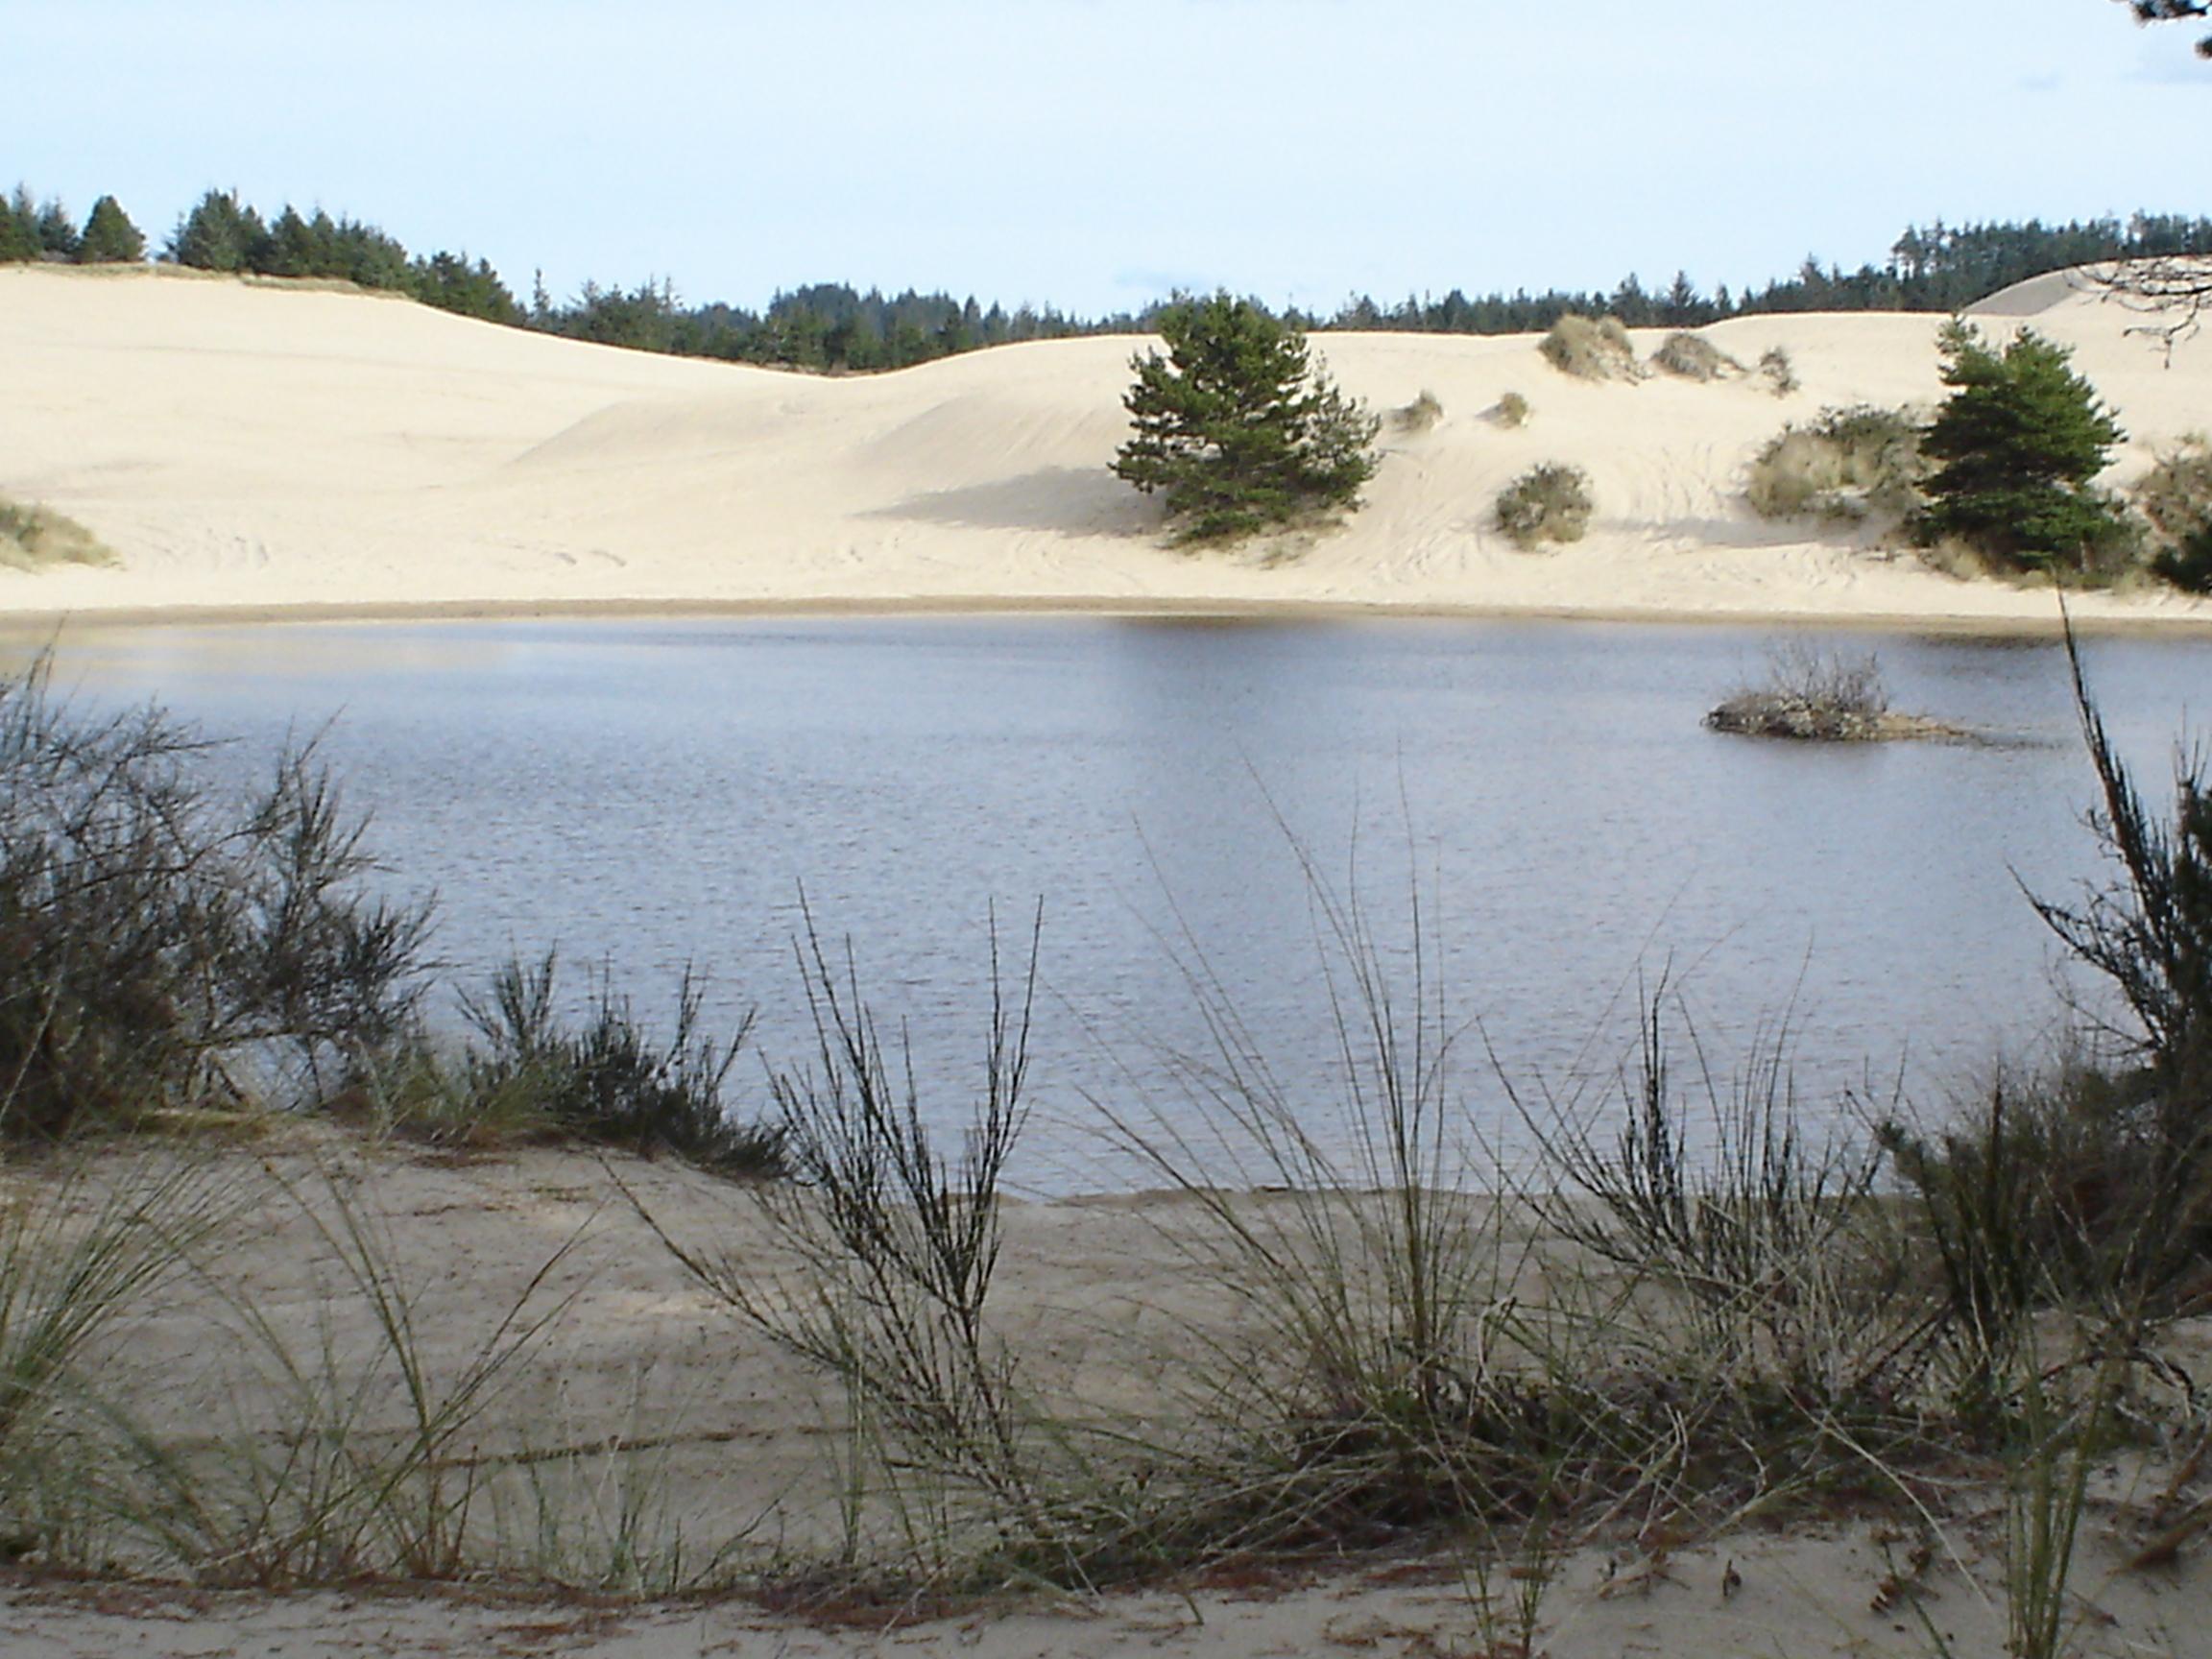 rain lake on dunes.JPG